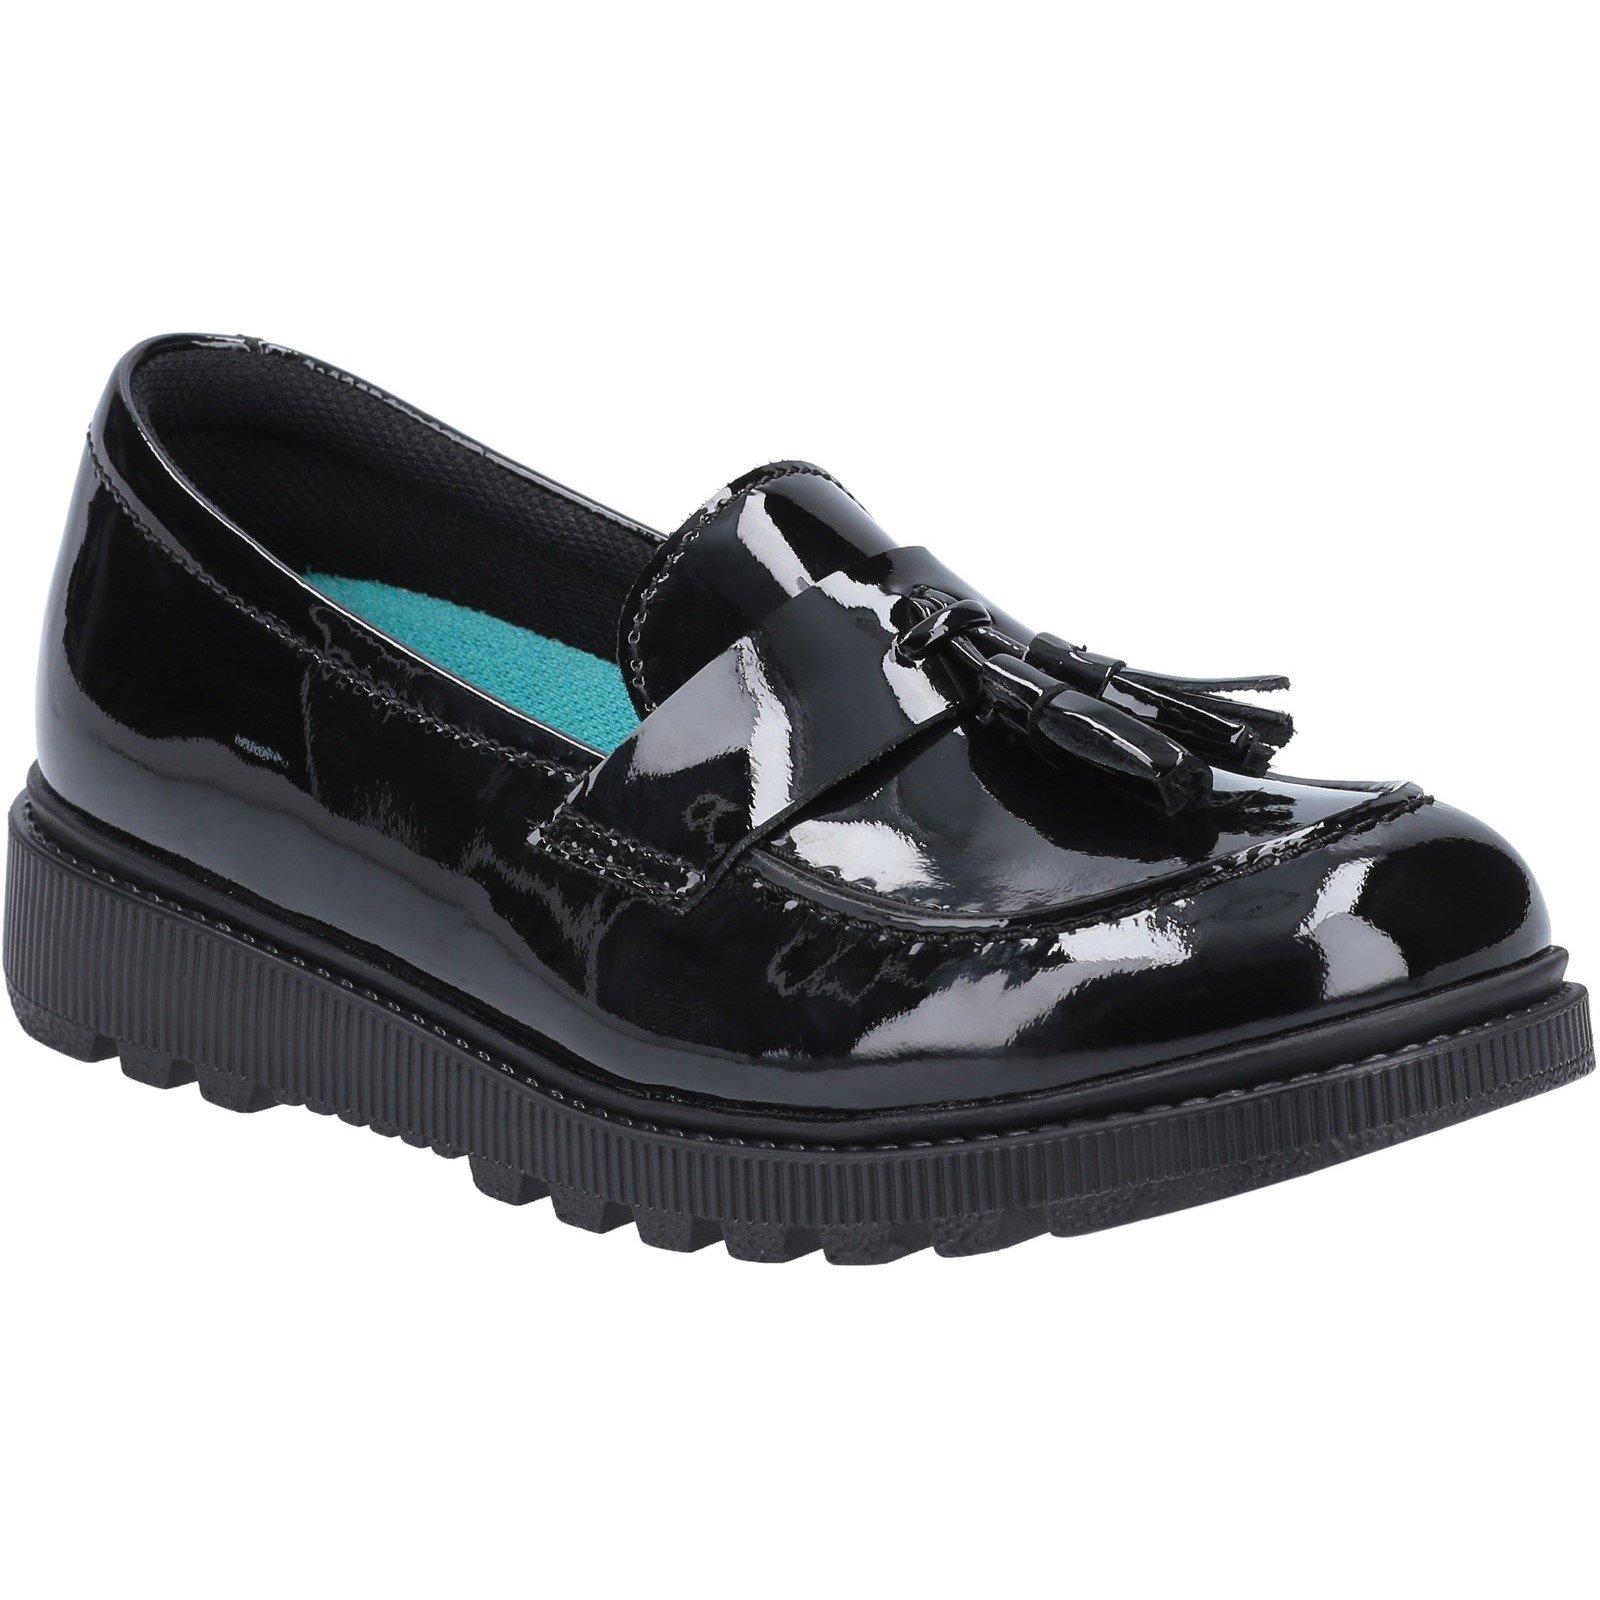 Hush Puppies Kid's Karen Senior School Shoe Patent Black 30828 - Patent Black 4